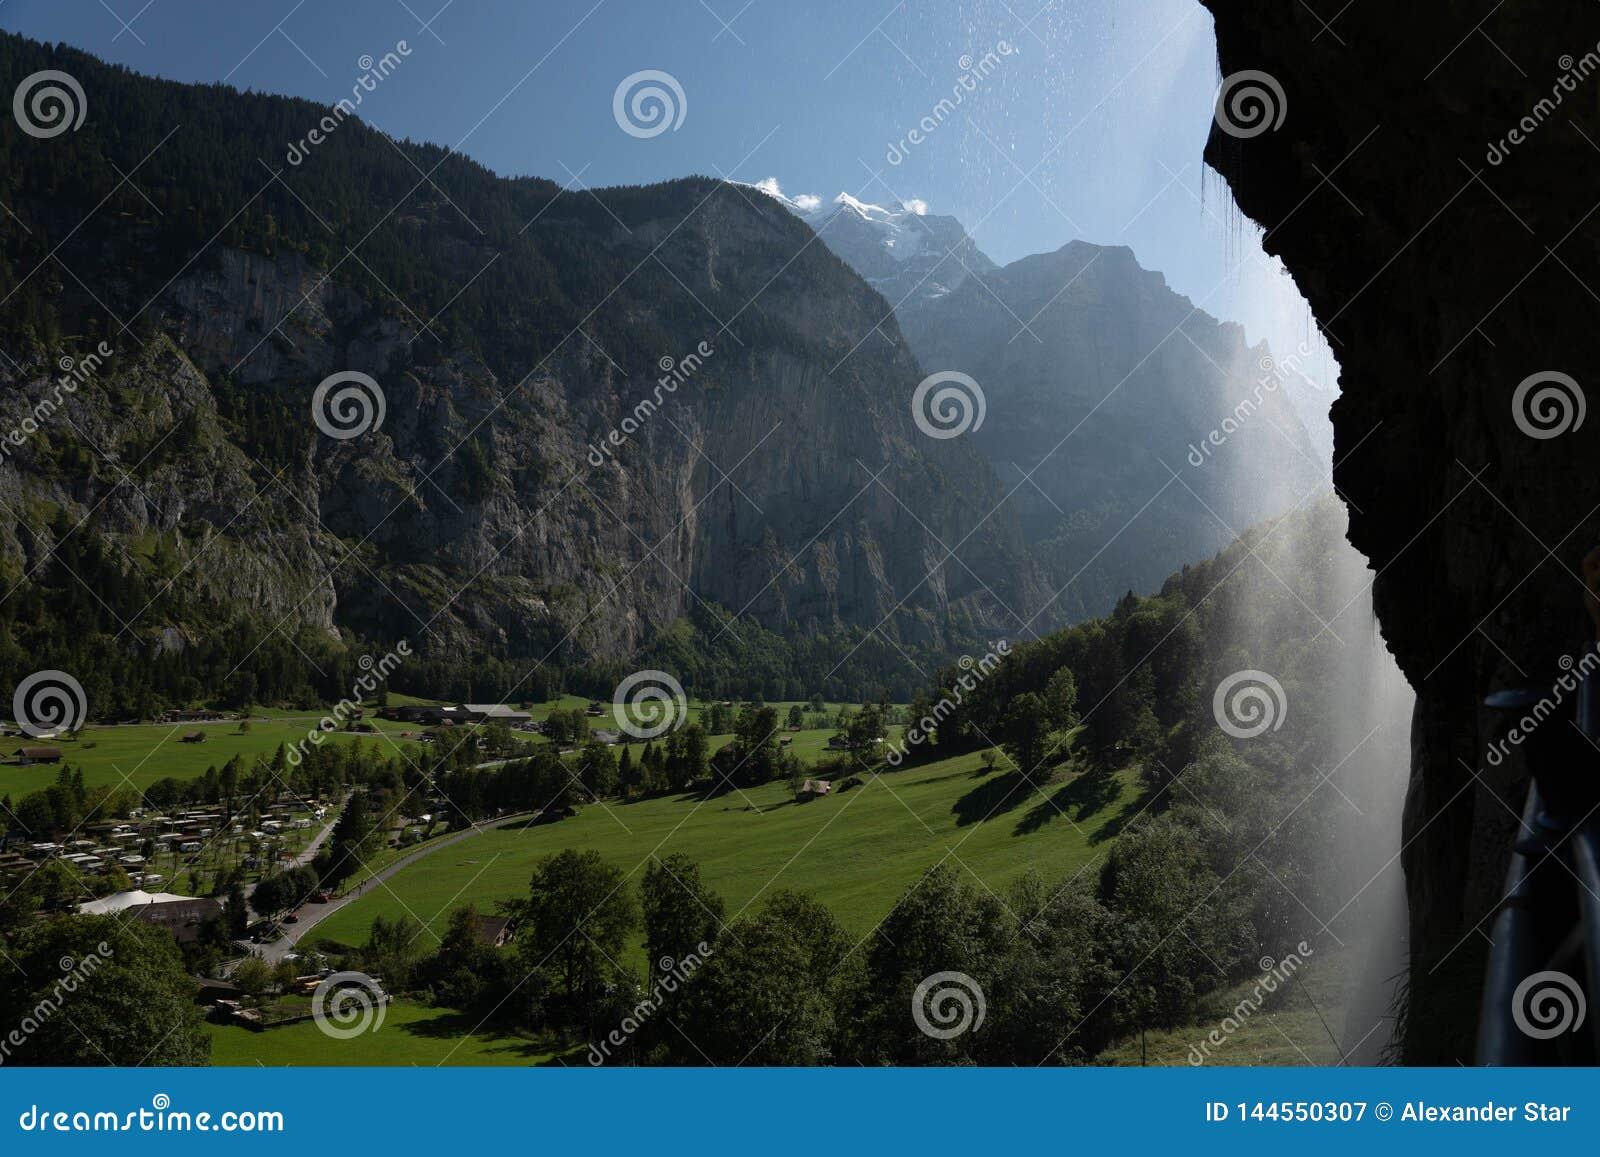 Swiss Alps countryside in lauterbrunnen valley